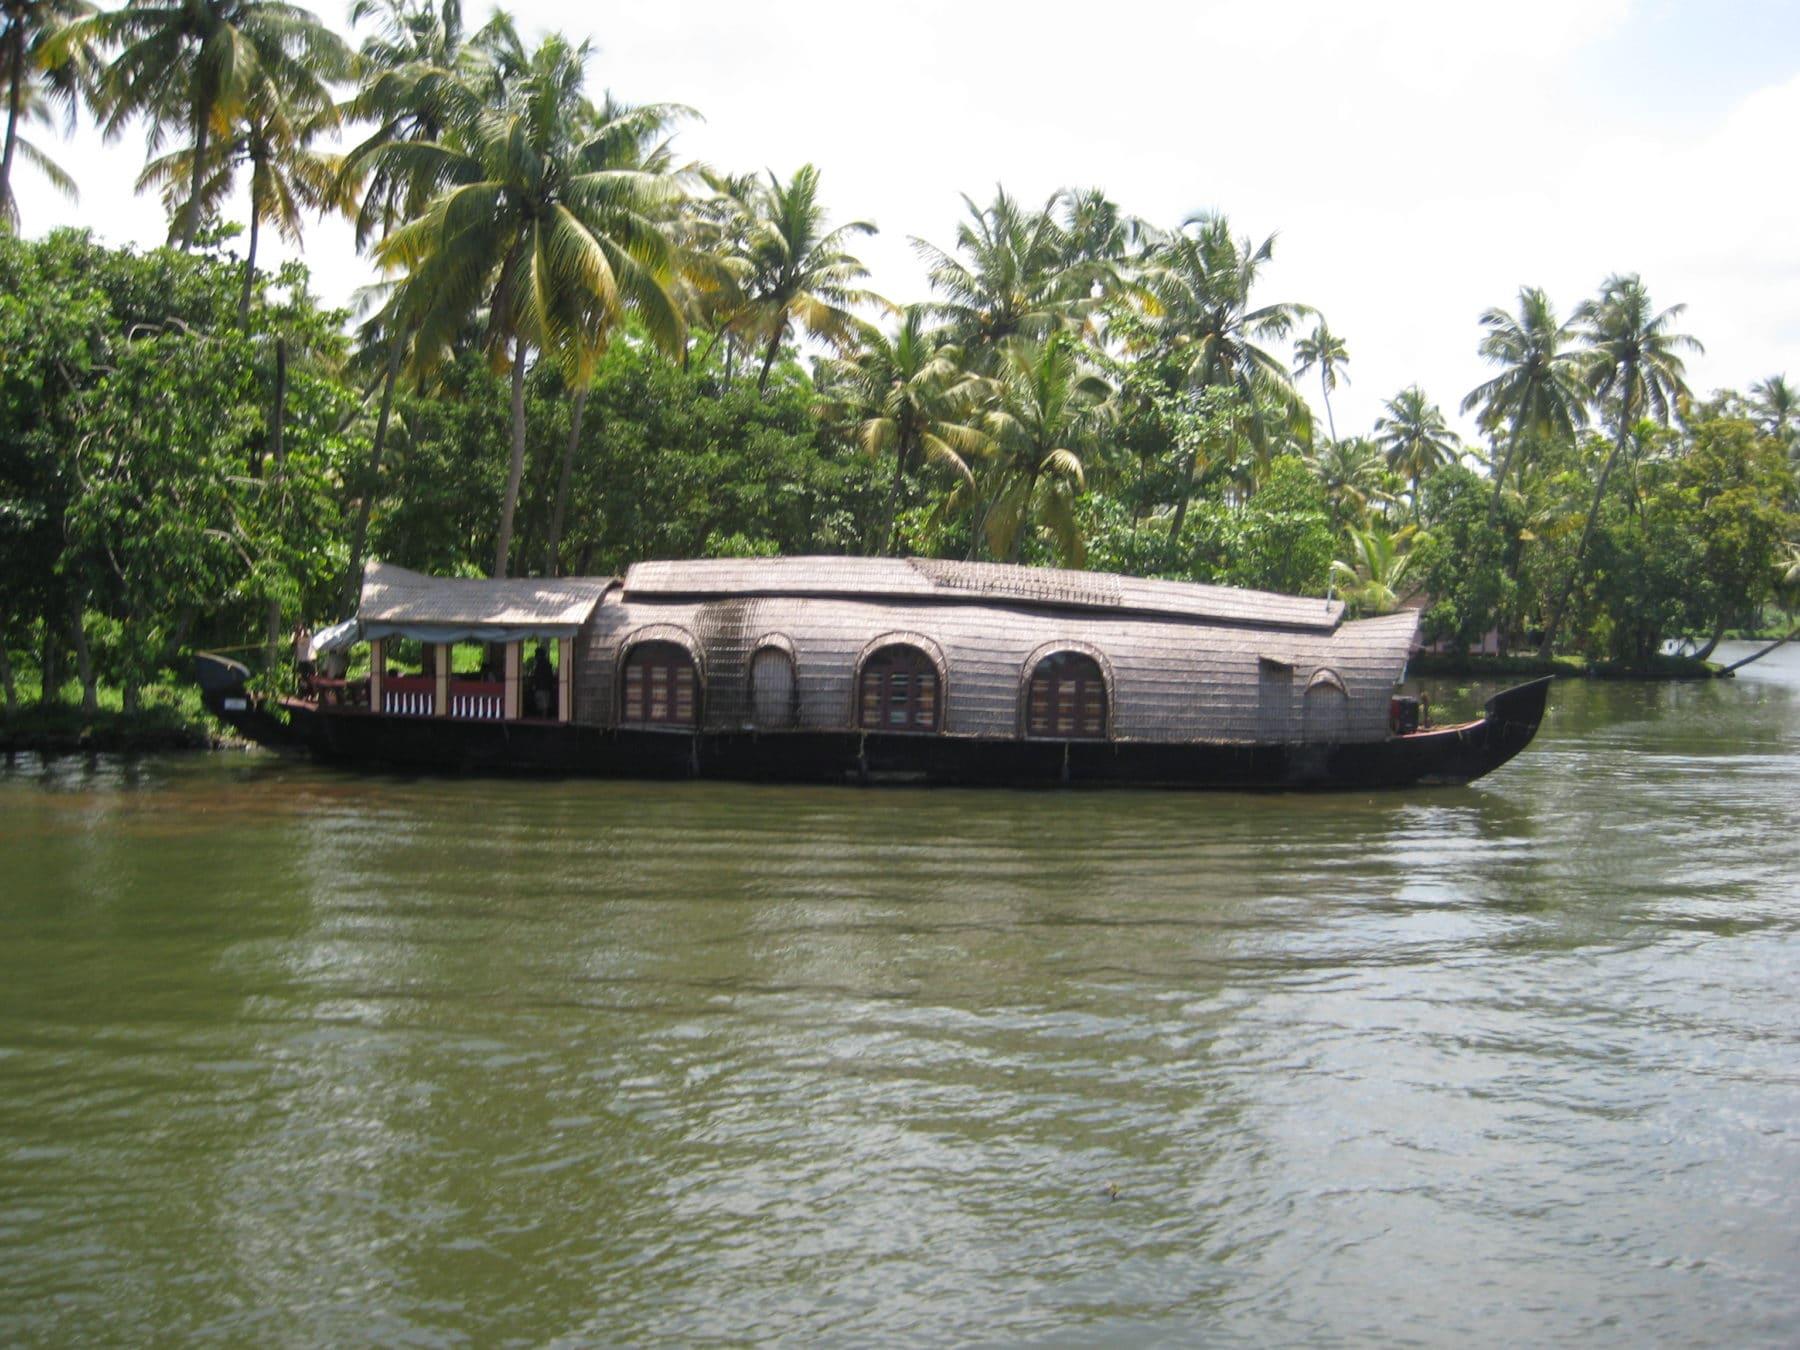 Hausboot in Lagune